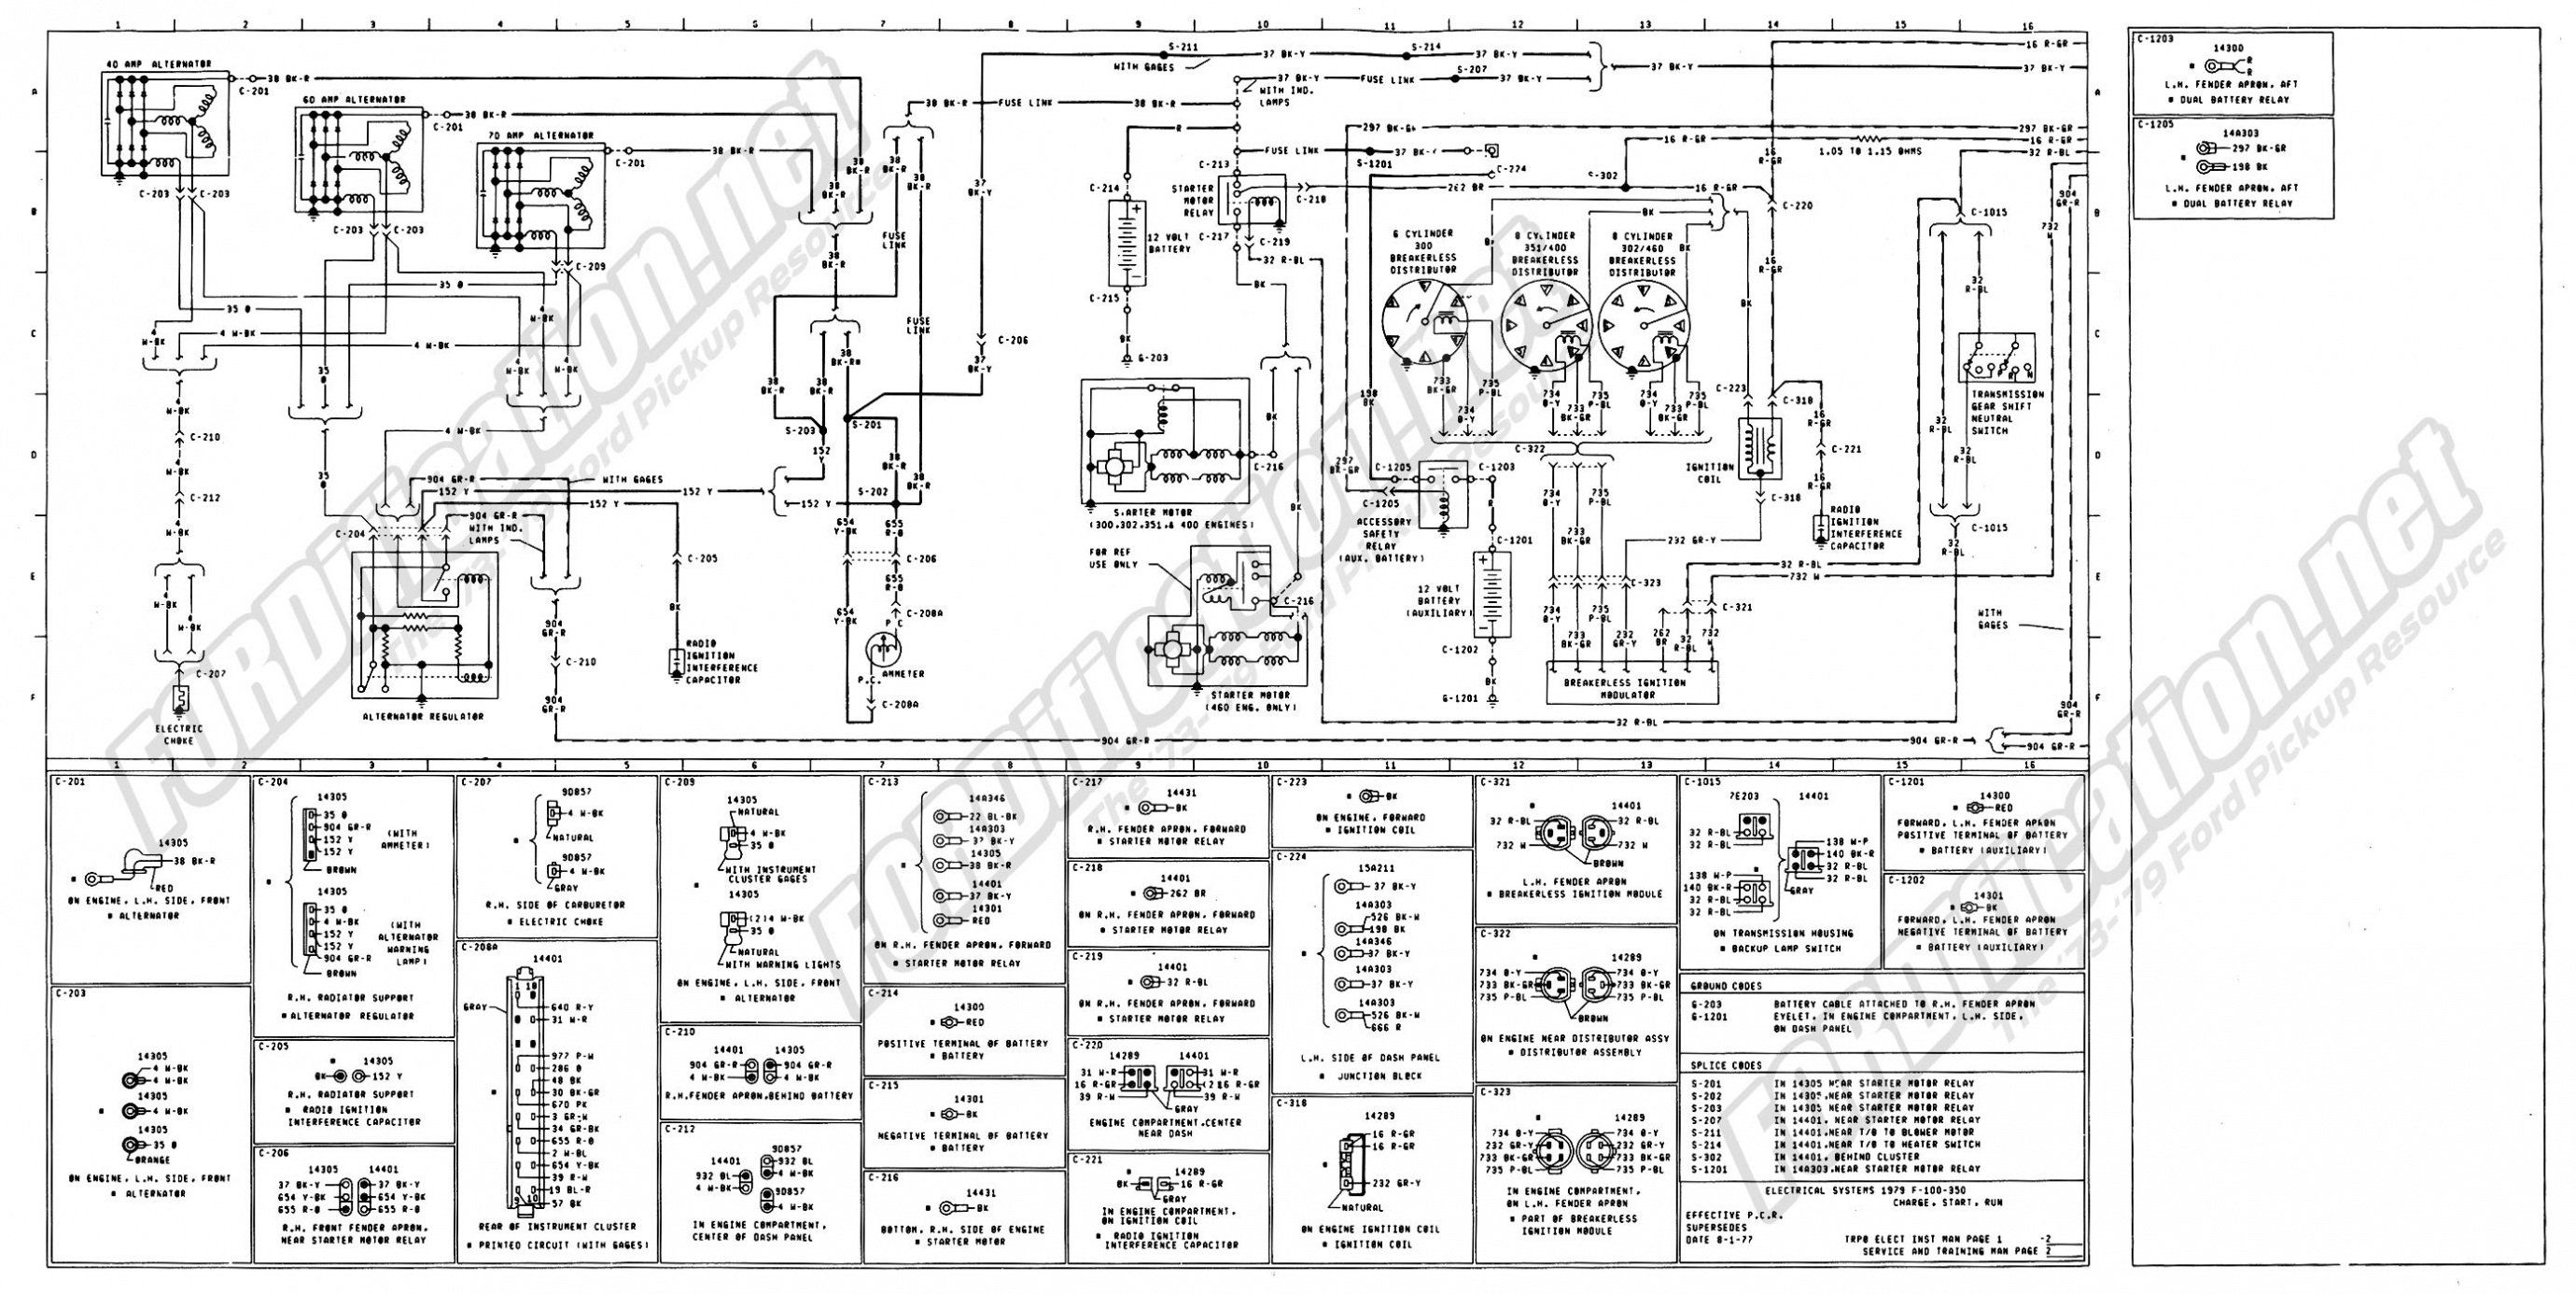 1991 F150 Radio Wiring Diagram Within 1985 Ford Ranger Zhuju – Ford - Ford F150 Wiring Harness Diagram